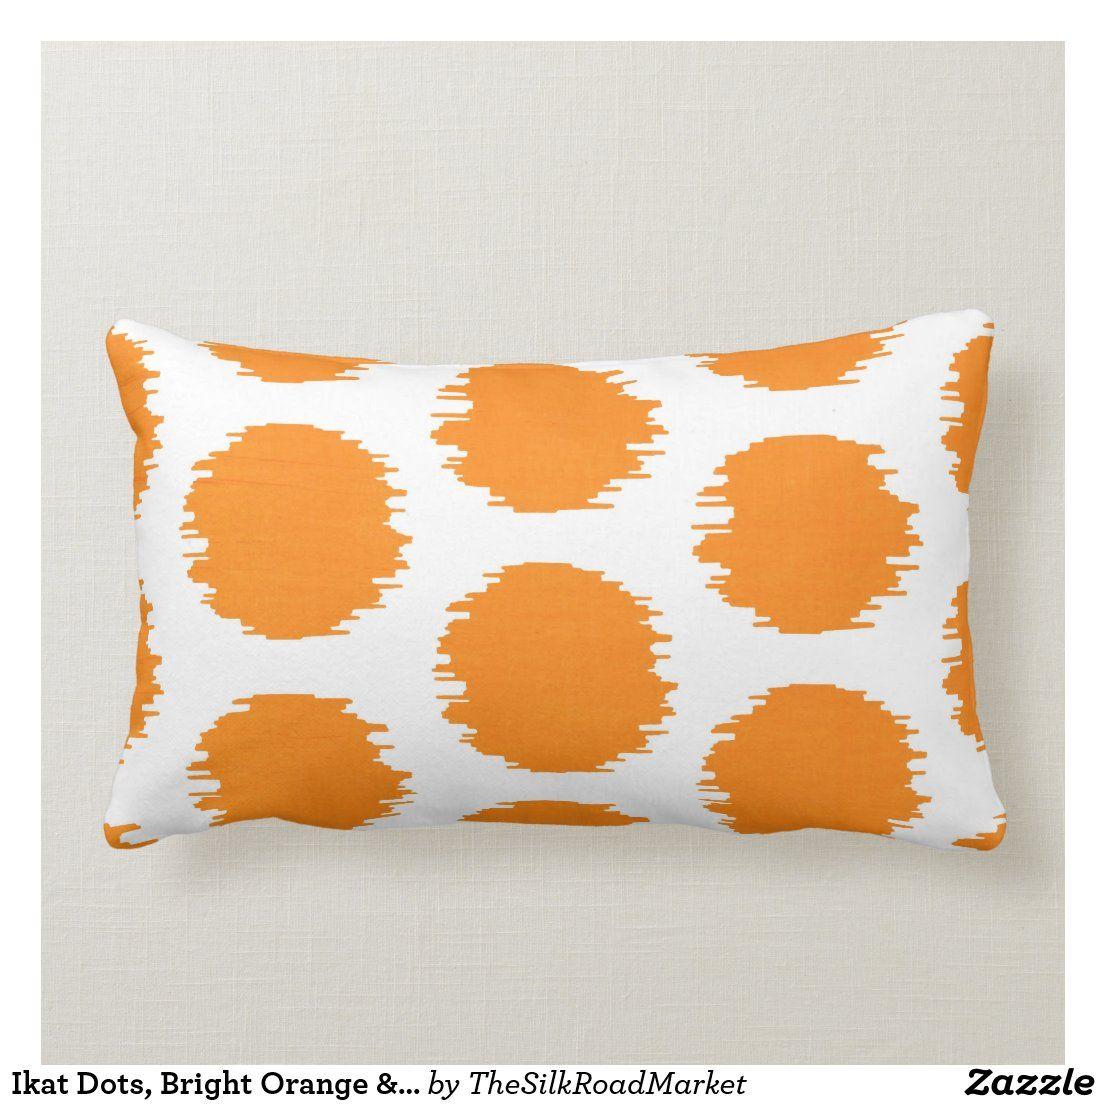 Ikat Dots Bright Orange White Print Lumbar Pillow Zazzle Com Ikat Dot Pillows Lumbar Pillow